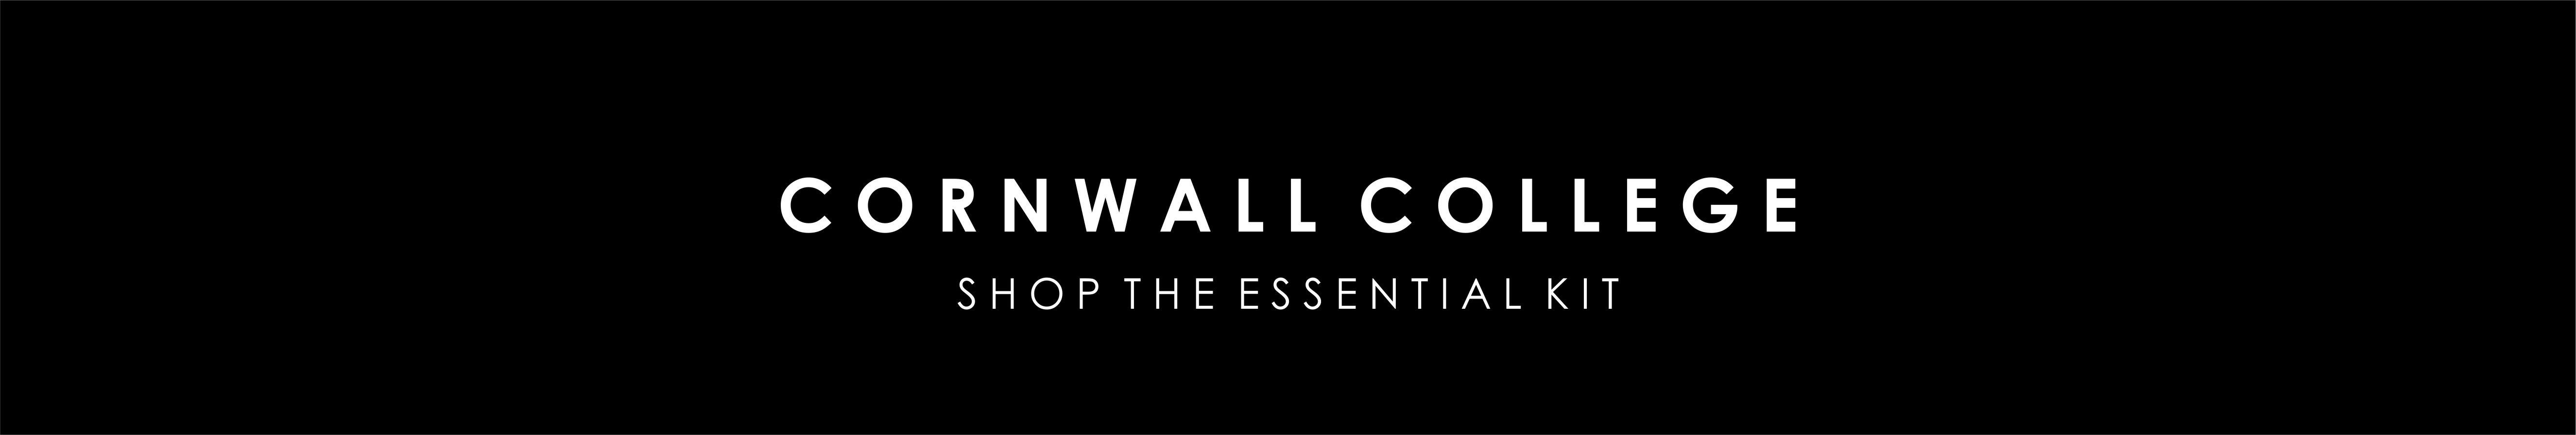 cornwall-college-banner-st-austell.jpg